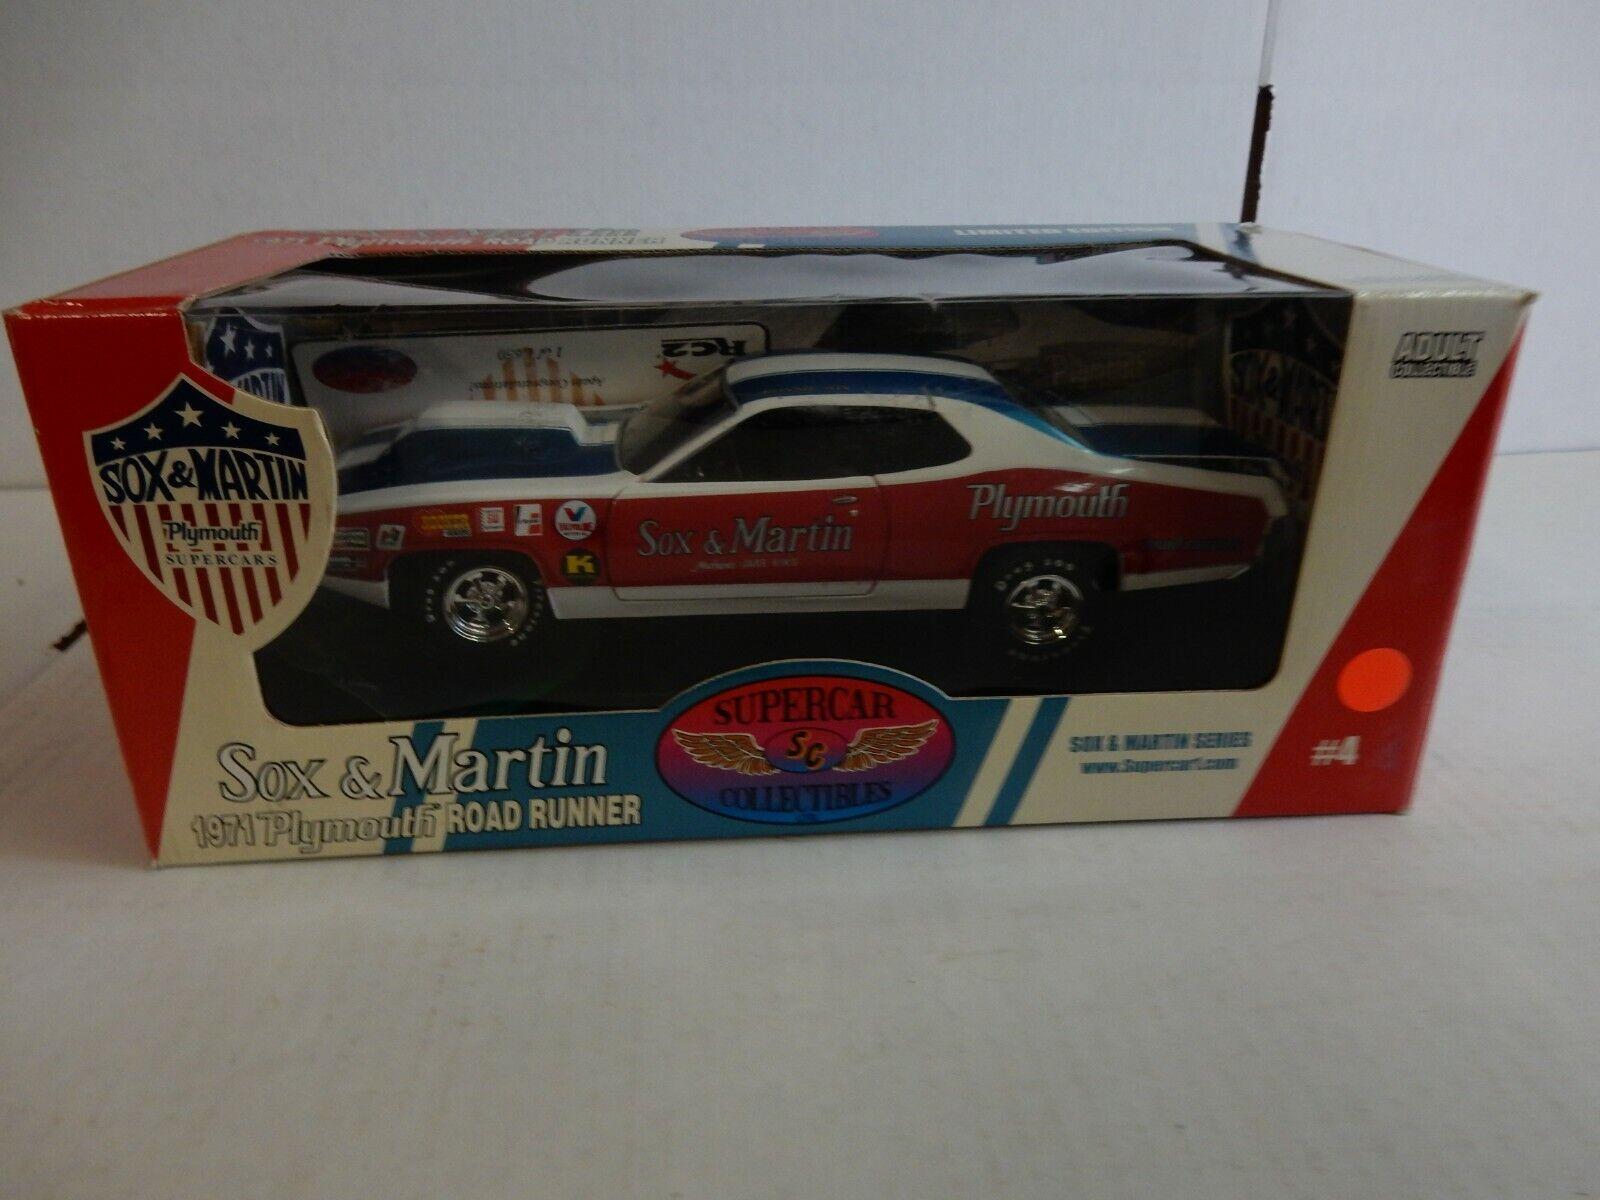 1971 PLYMOUTH ROAD RUNNER SOX & MARTIN  RACE CAR  1.18 DIECAST  NHRA